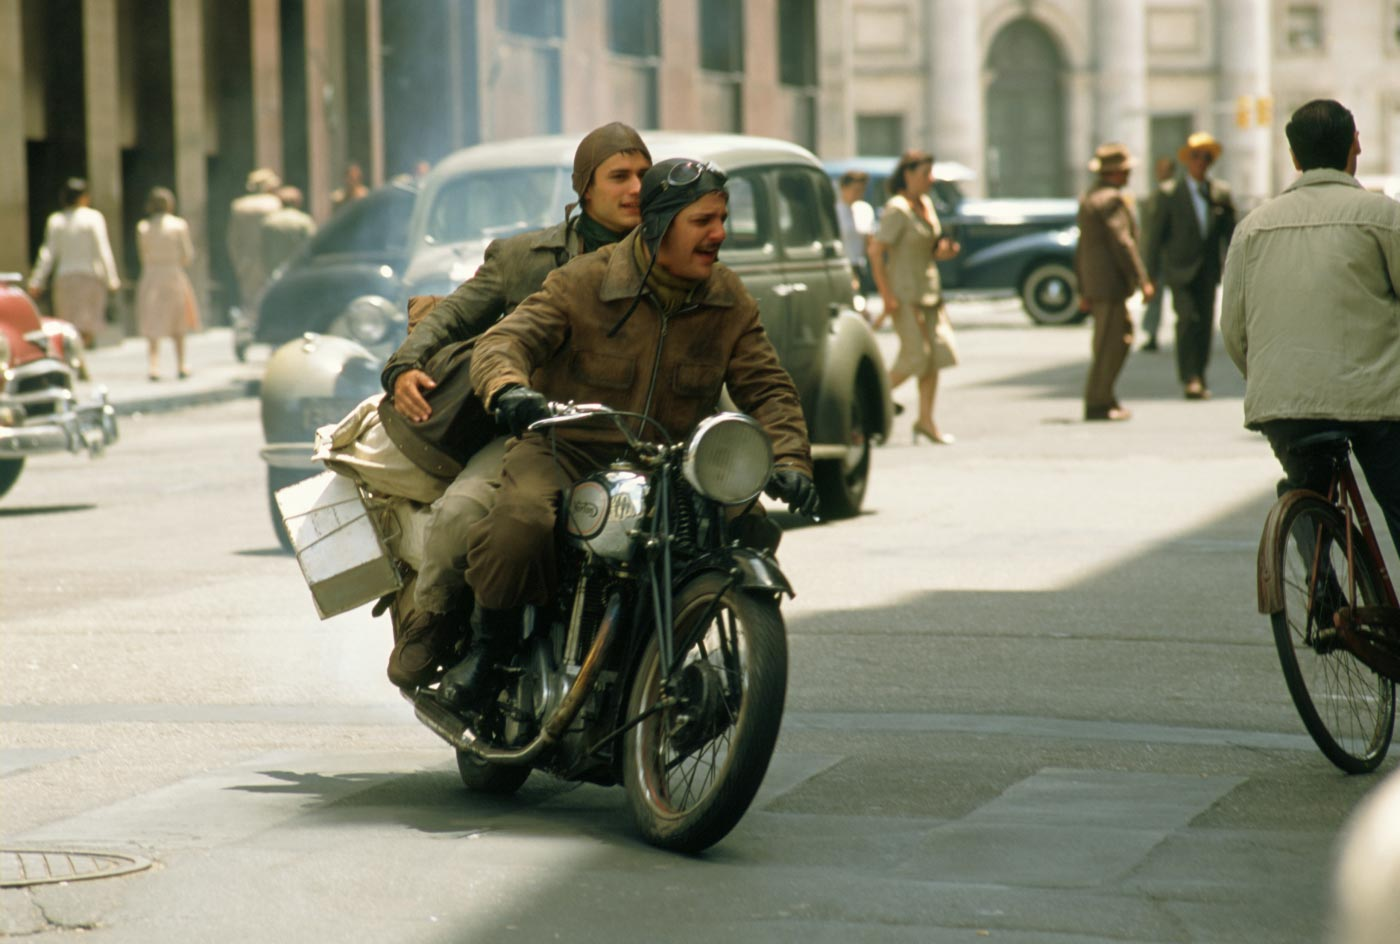 ... Motorcycle Diaries 2004 Used Trade Paper Paper 1920888101 | eBay